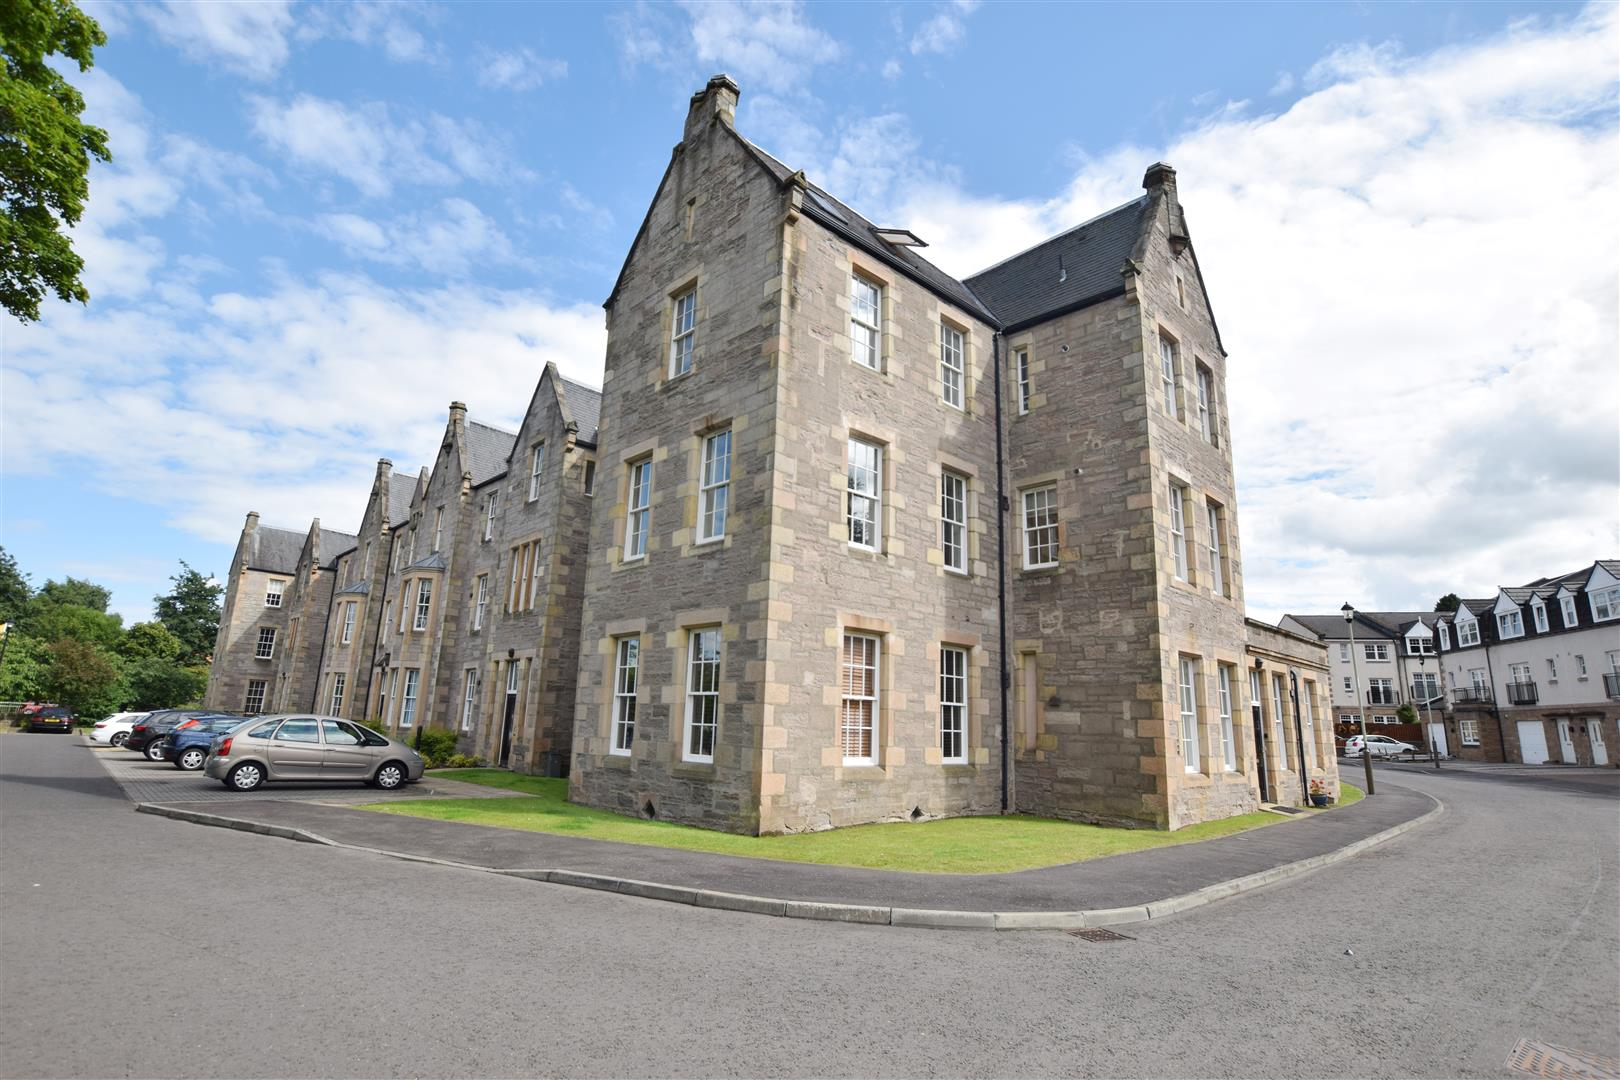 20, Rosslyn House, Glasgow Road, Perth, Perthshire, PH2 0GX, UK